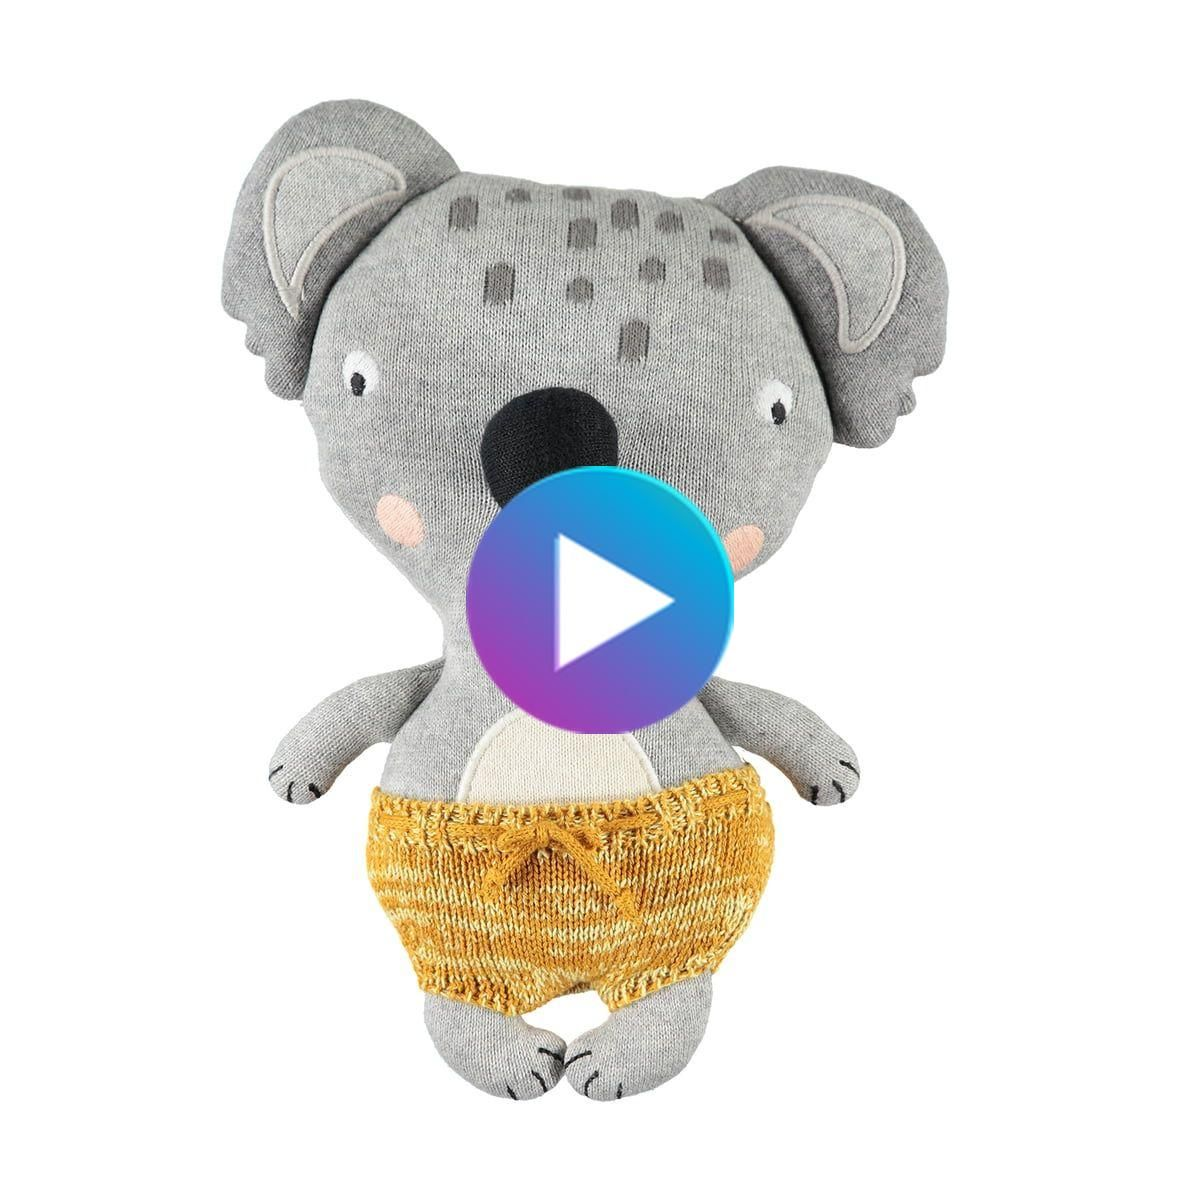 Oyoy ニットソフトおもちゃ 赤ちゃんコアラアントン Baby Koala Dinosaur Stuffed Animal Animals